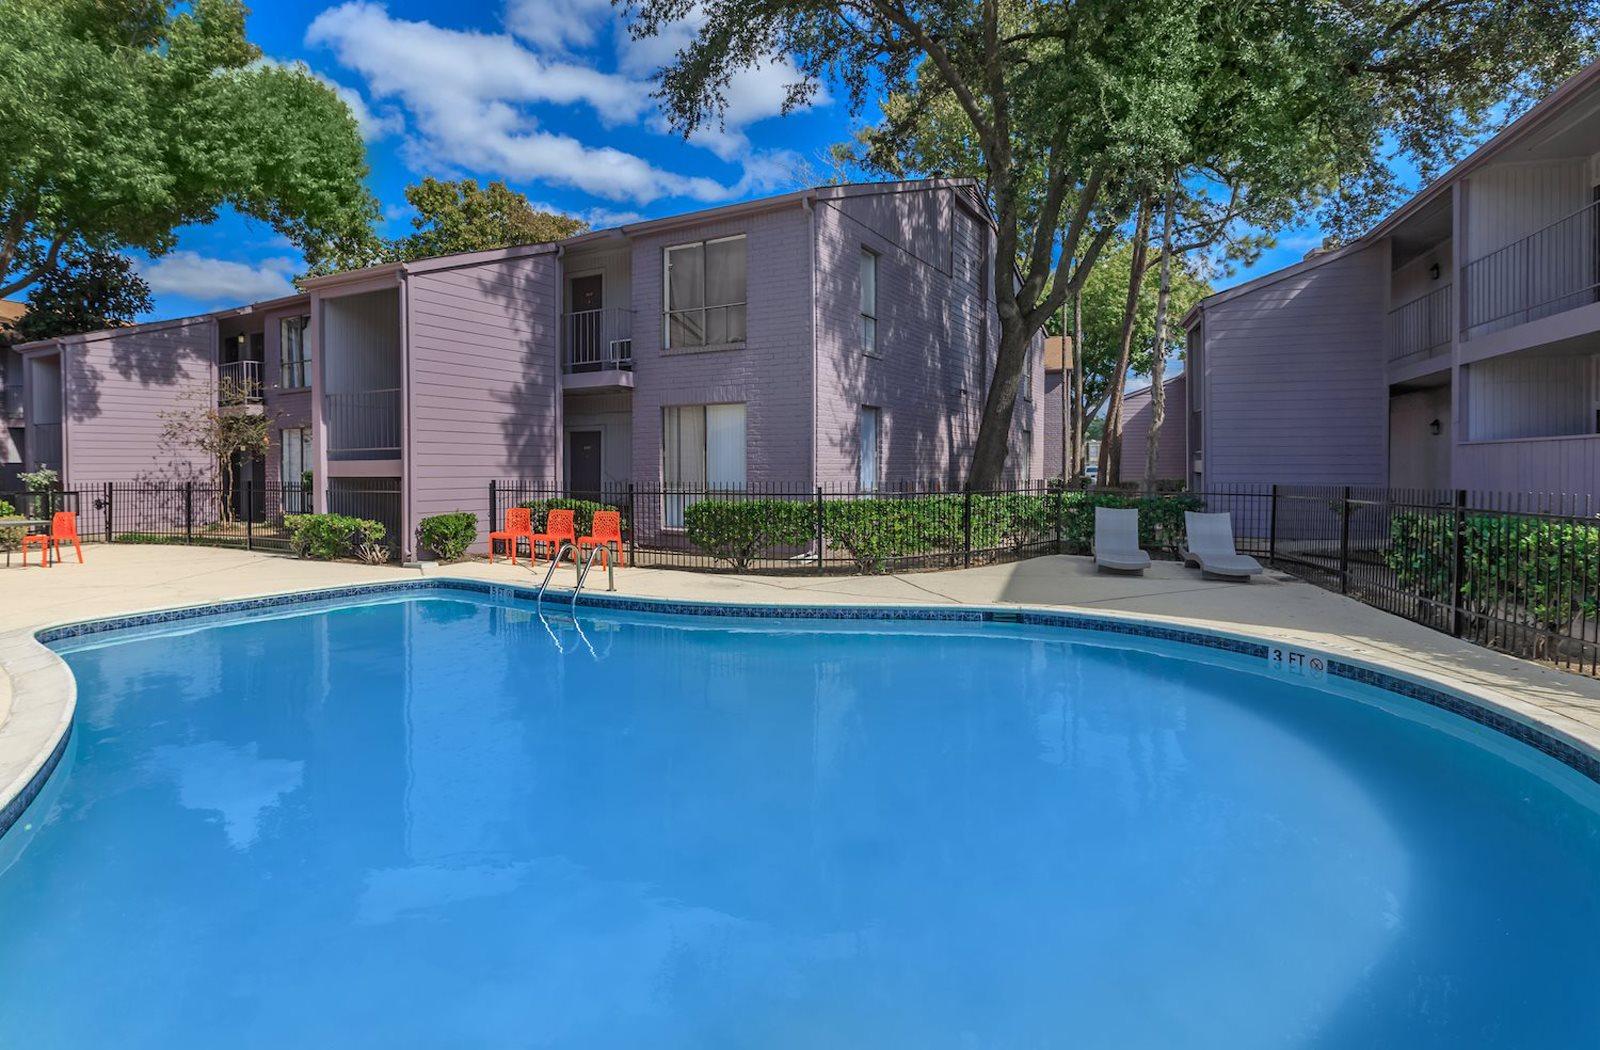 Resort Style Poolat Olympia Flats, Houston, TX, 77077